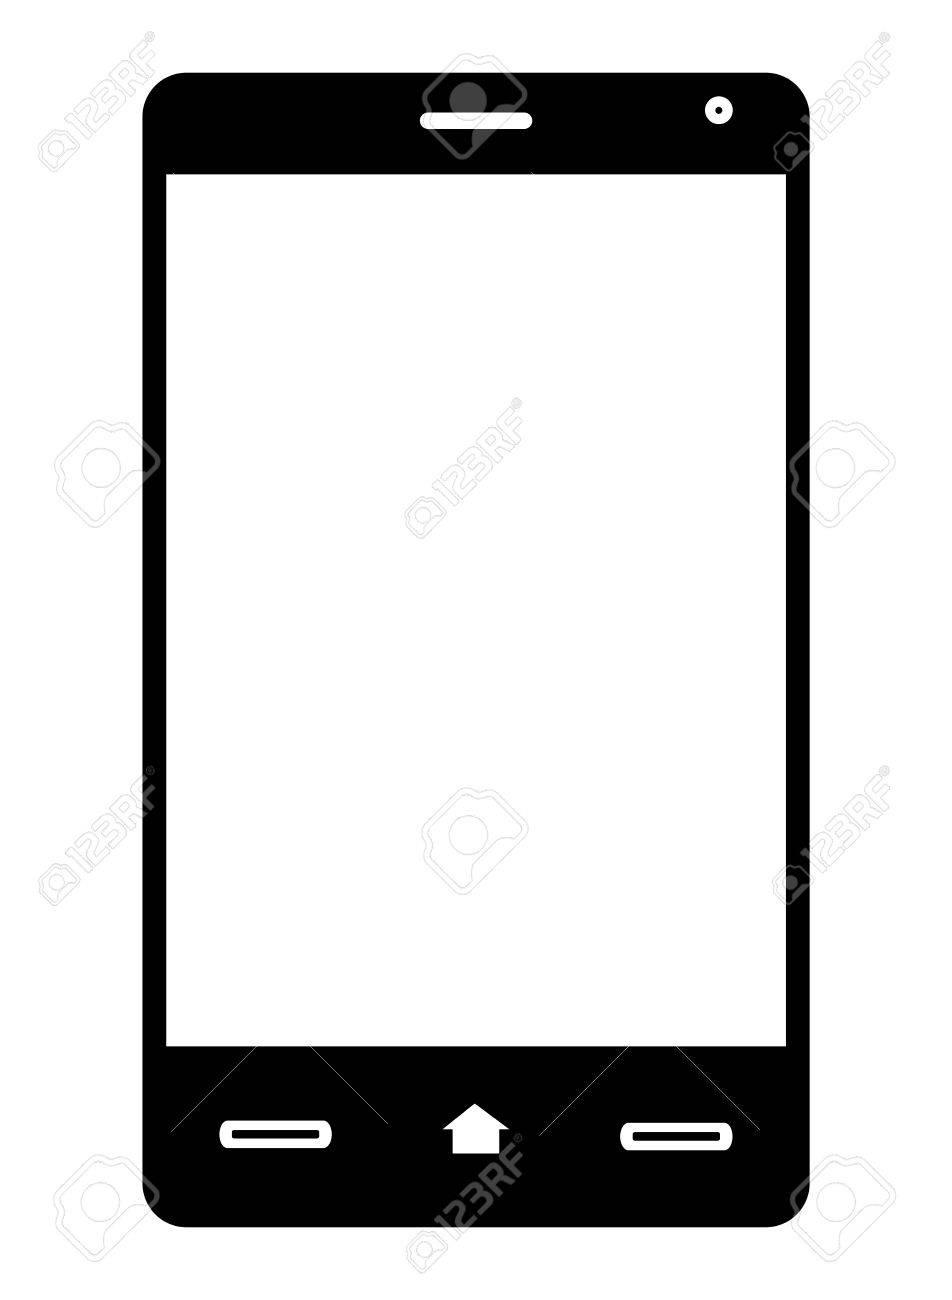 Smartphone Clip Art